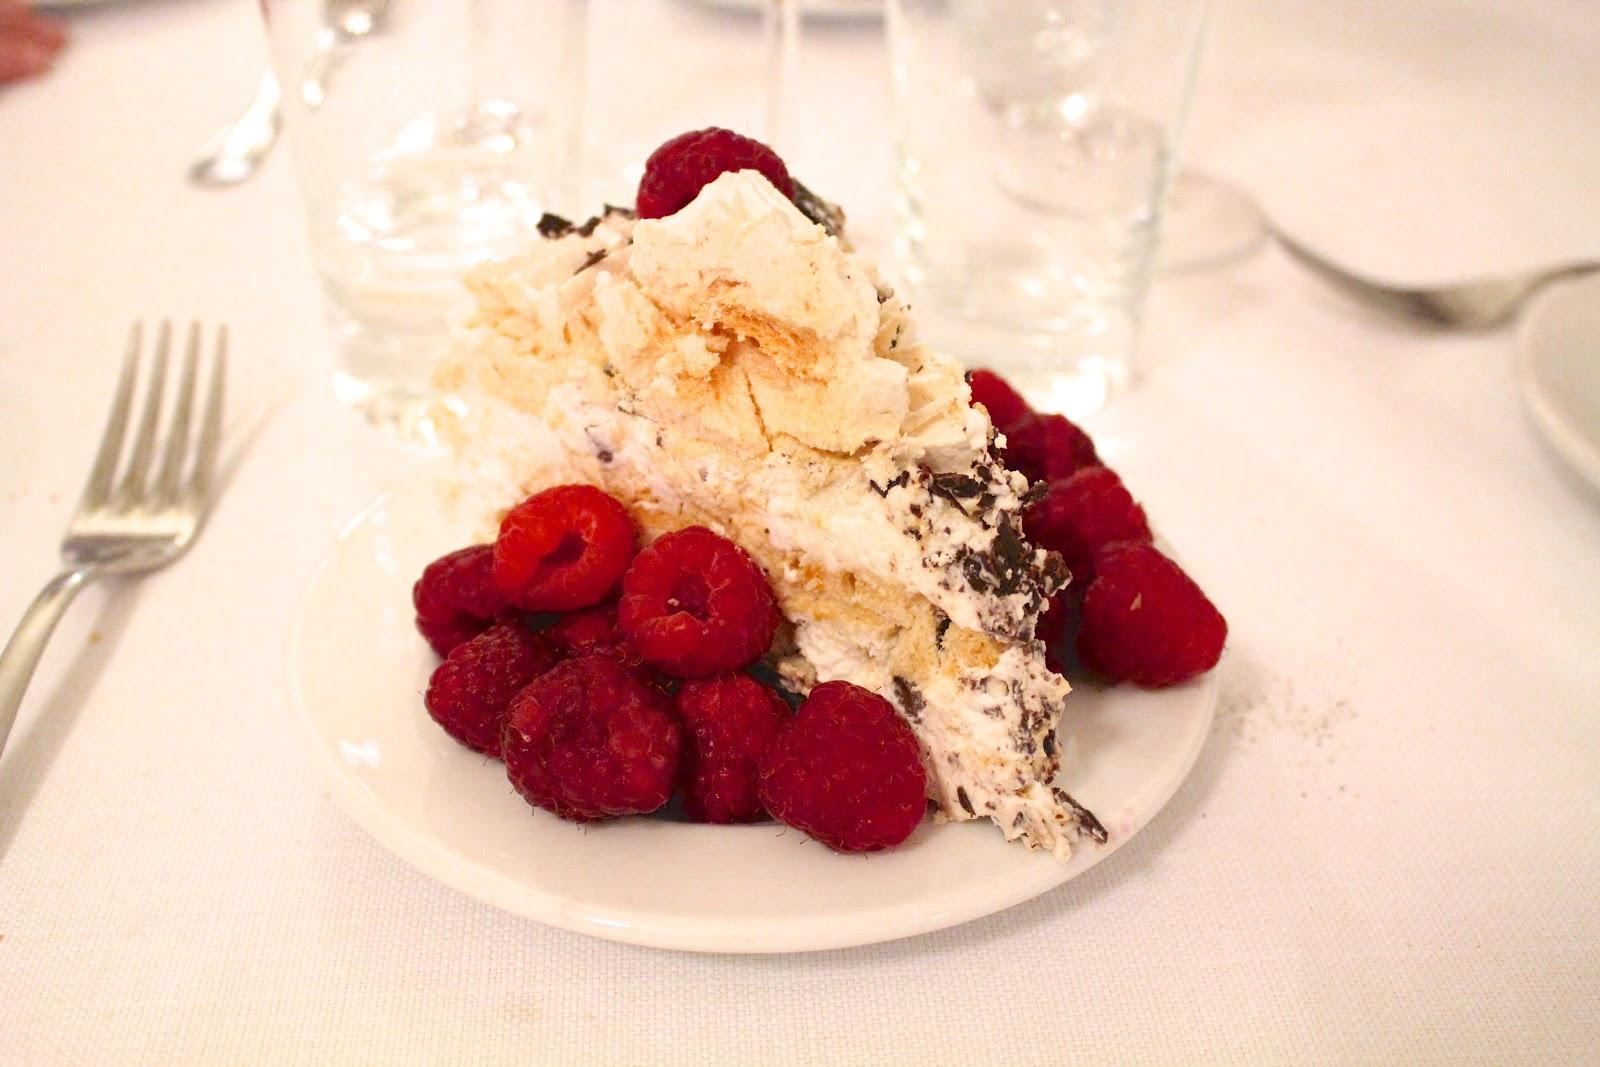 Trattoria Sostanza Firenze dessert